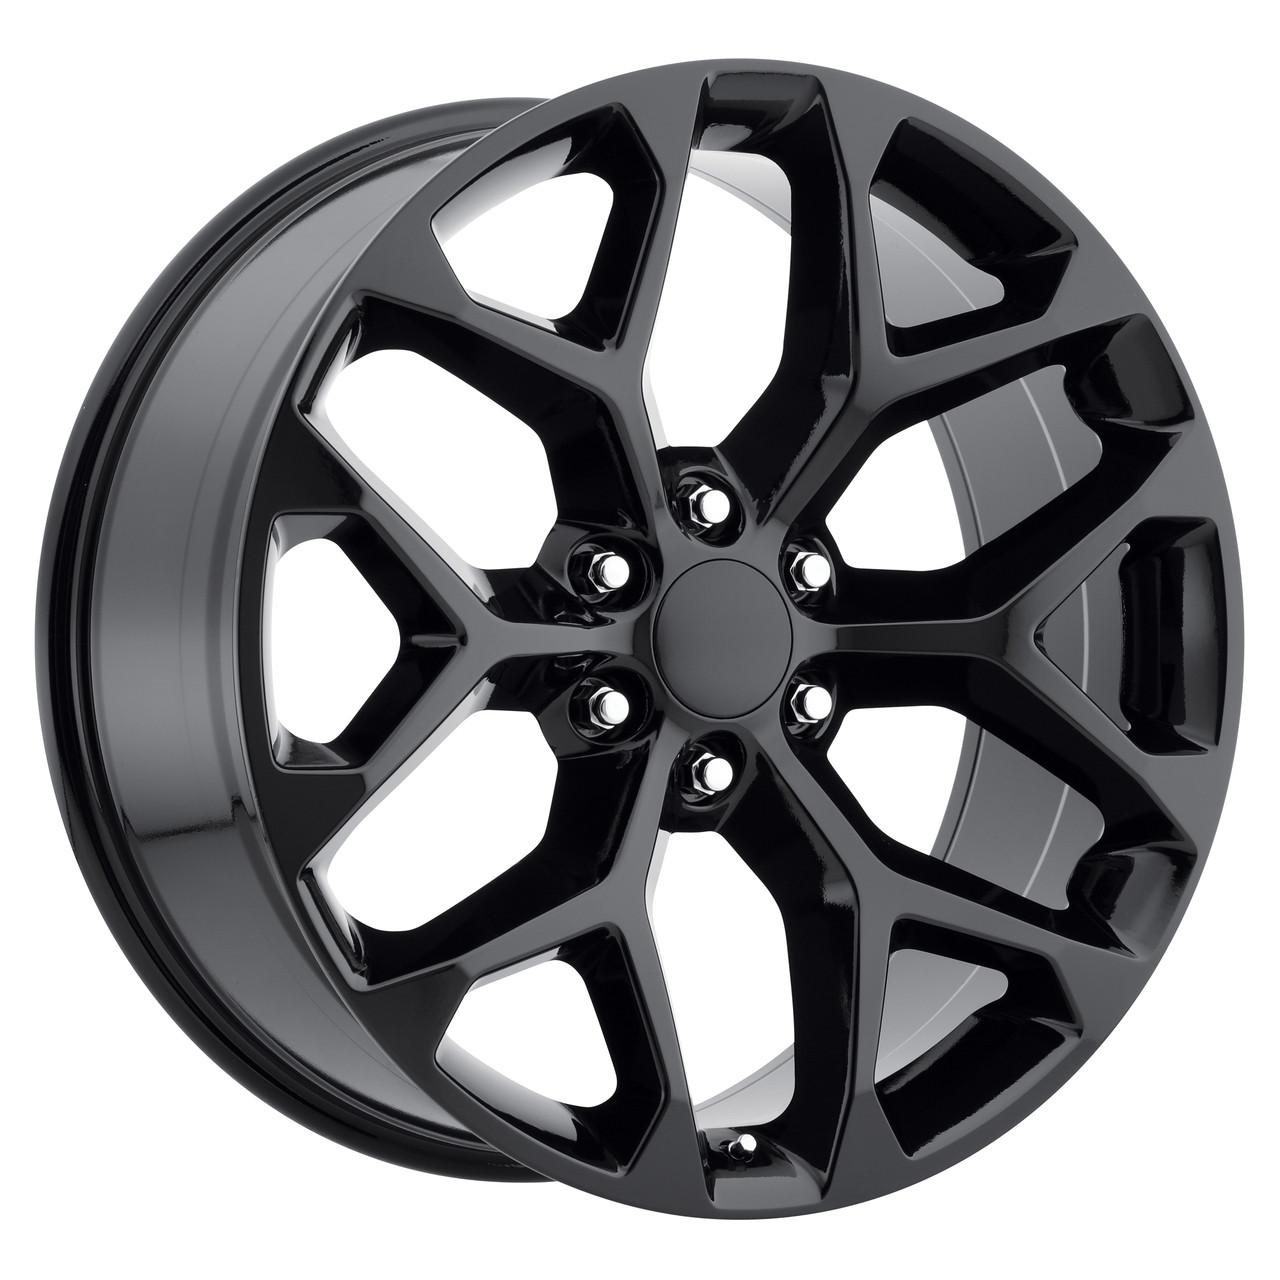 "24"" 2015 CK156 CK 156 Chevy Silverado GMC Sierra 1500 Cadillac Gloss Black  Wheels Set"